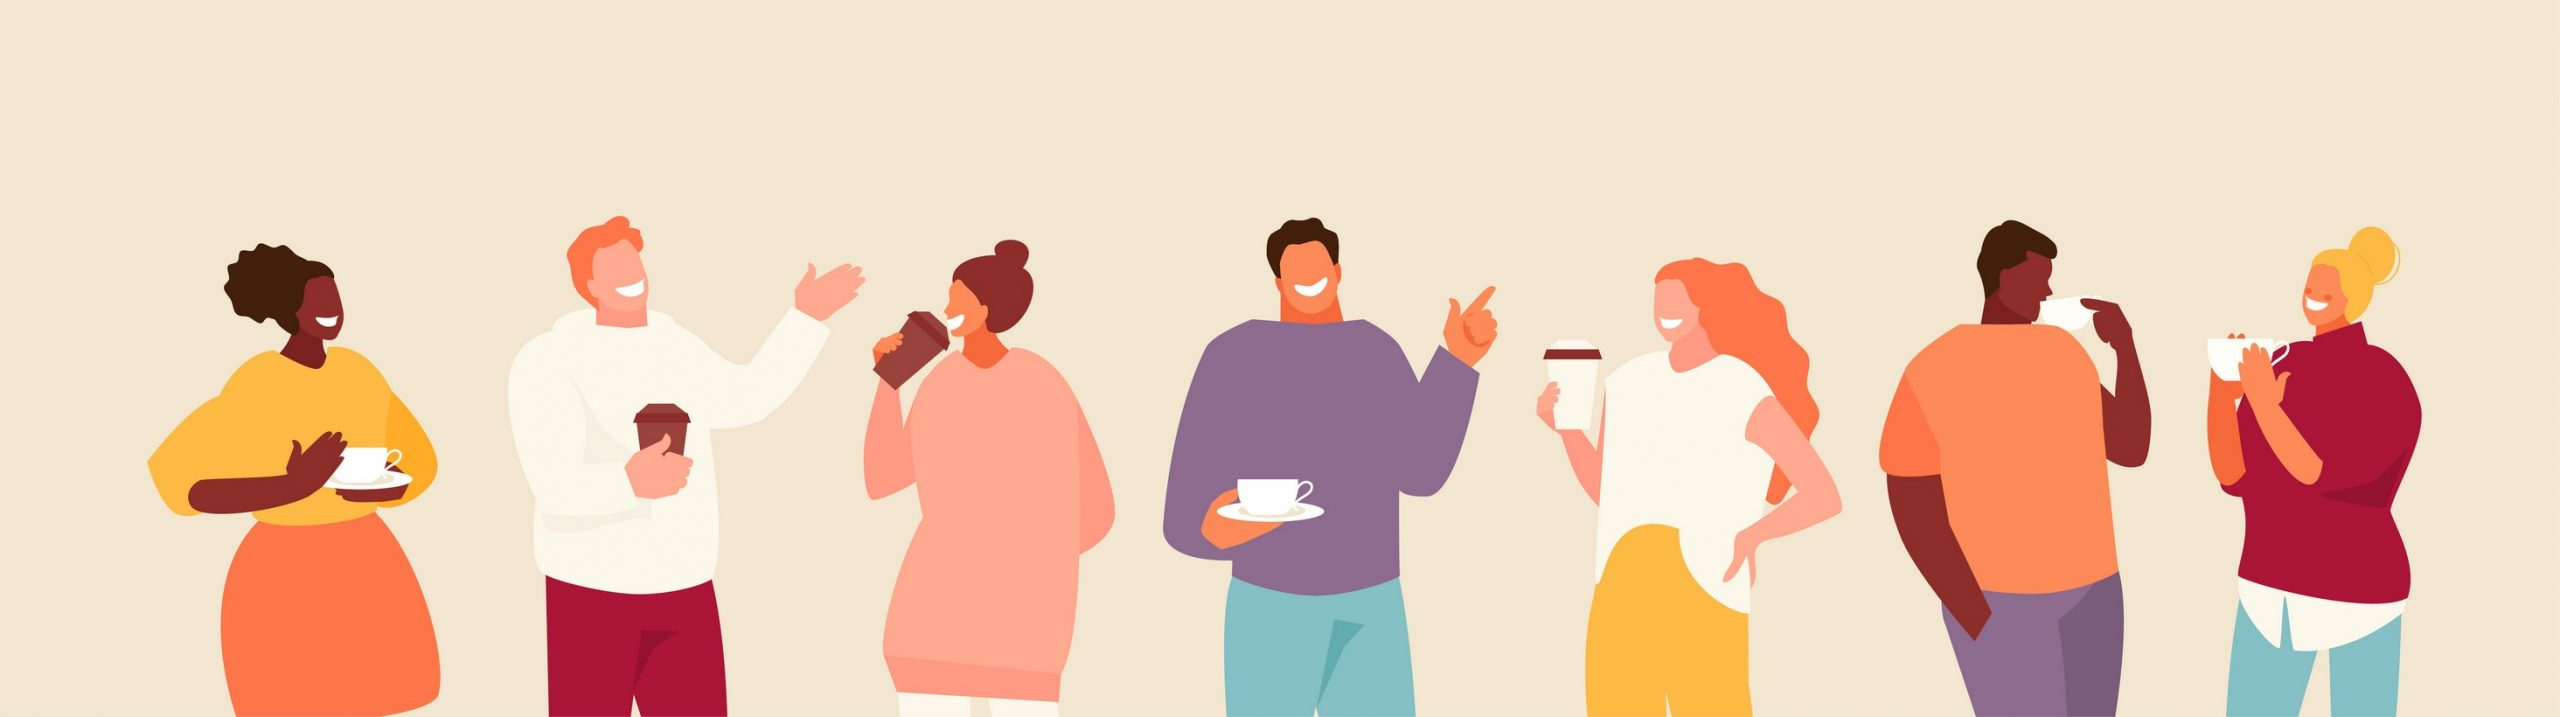 Phoenix Employee Benefit | Coffee Service | Workplace Culture